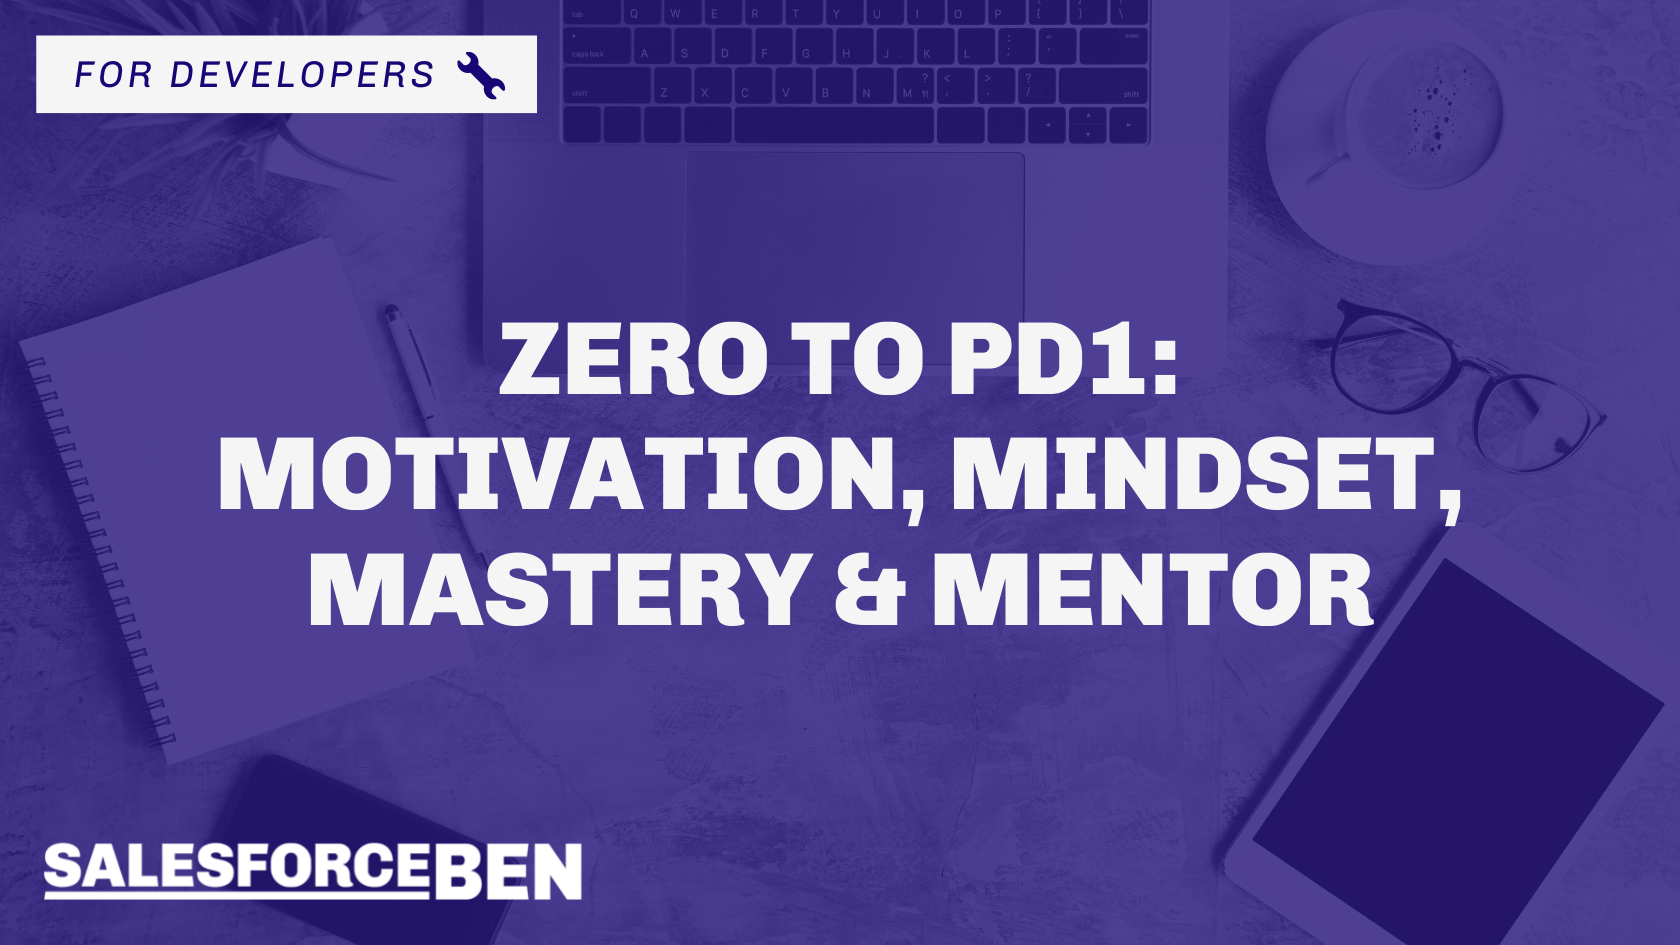 Zero to PD1: Motivation, Mindset, Mastery & Mentor